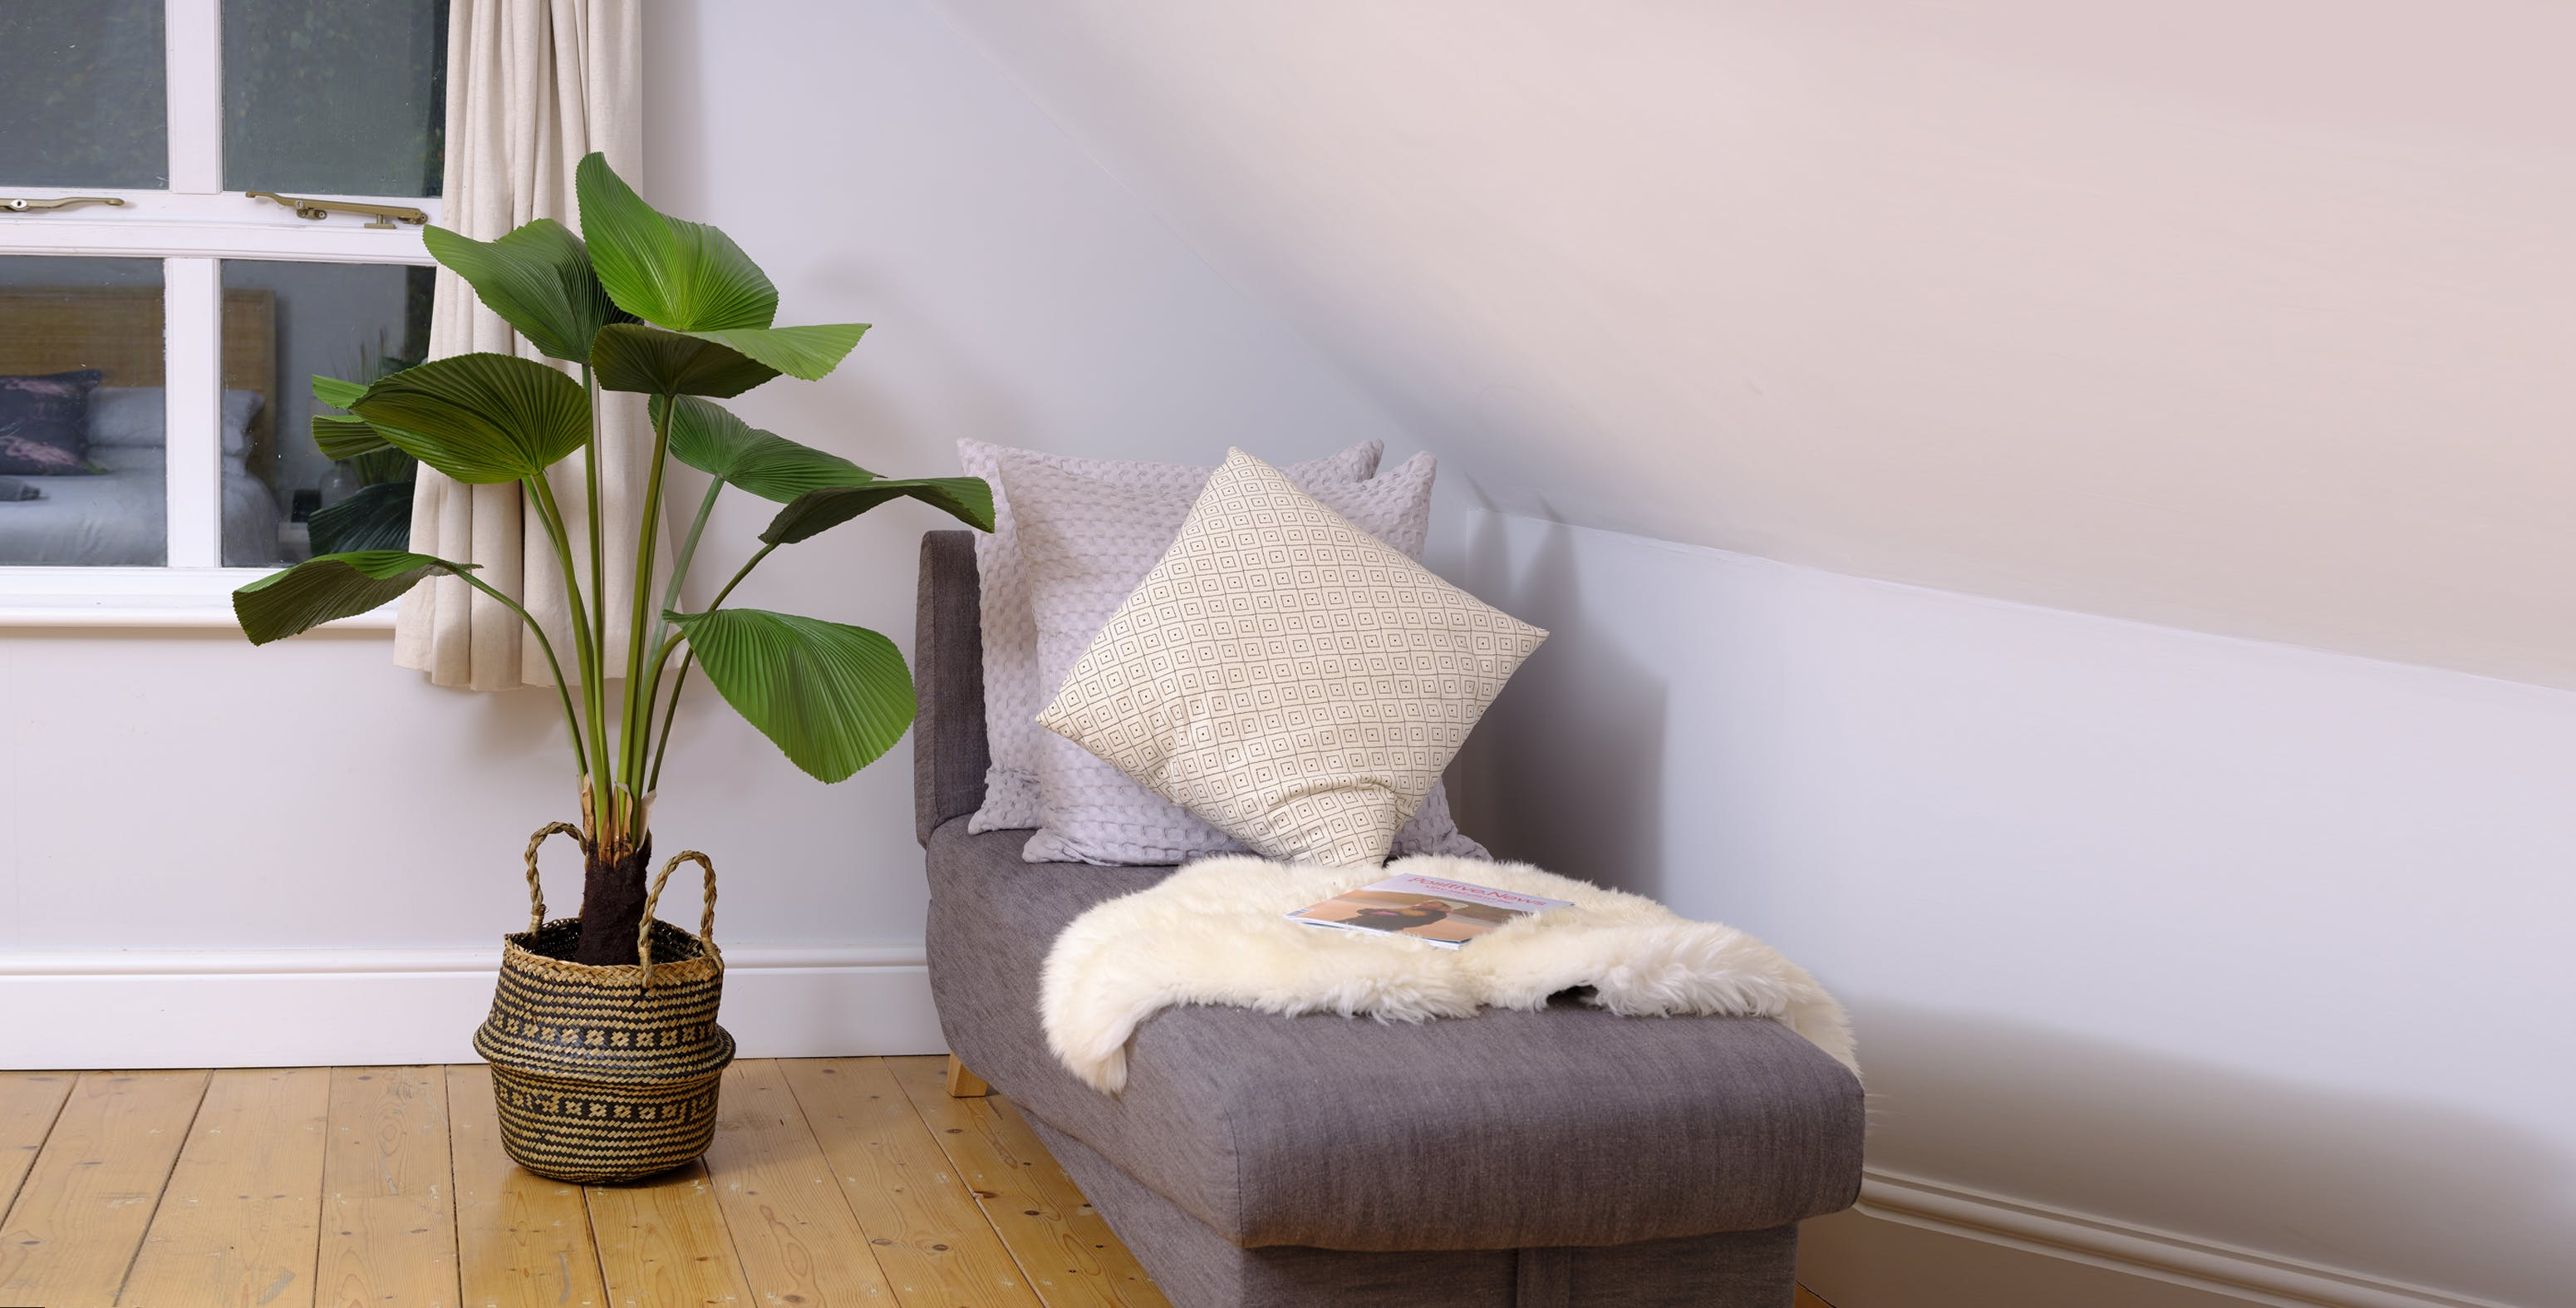 Artificial licuala palm near lounge chair